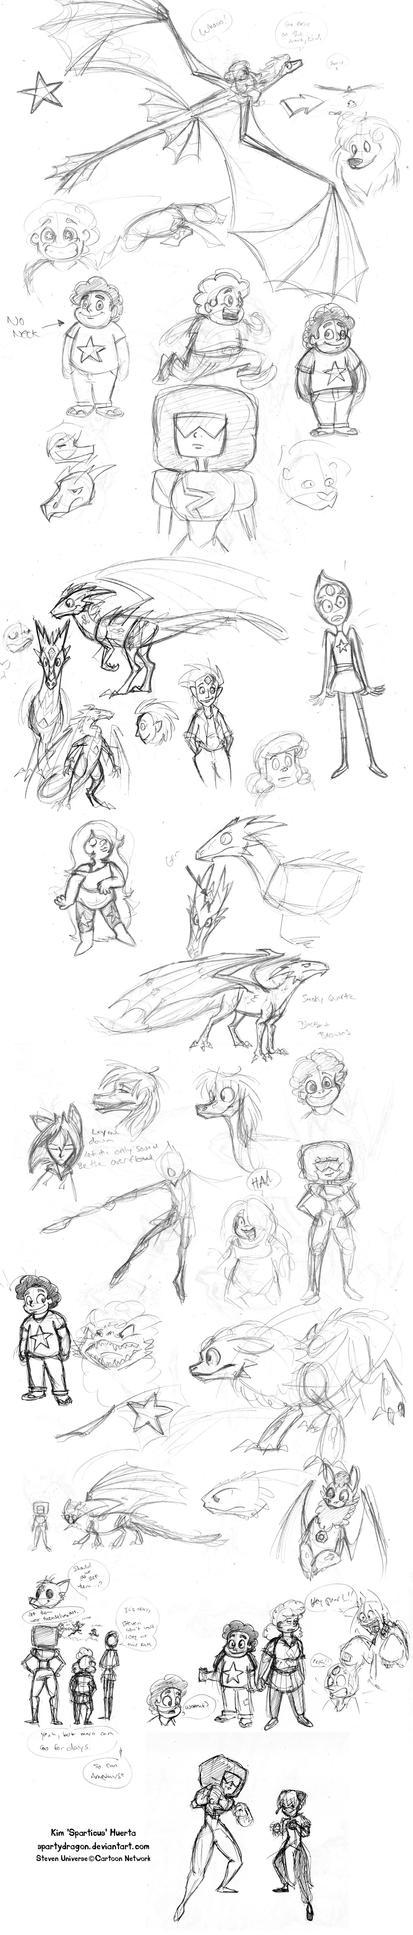 Big Giant Steven Universe Sketchdump by spartydragon